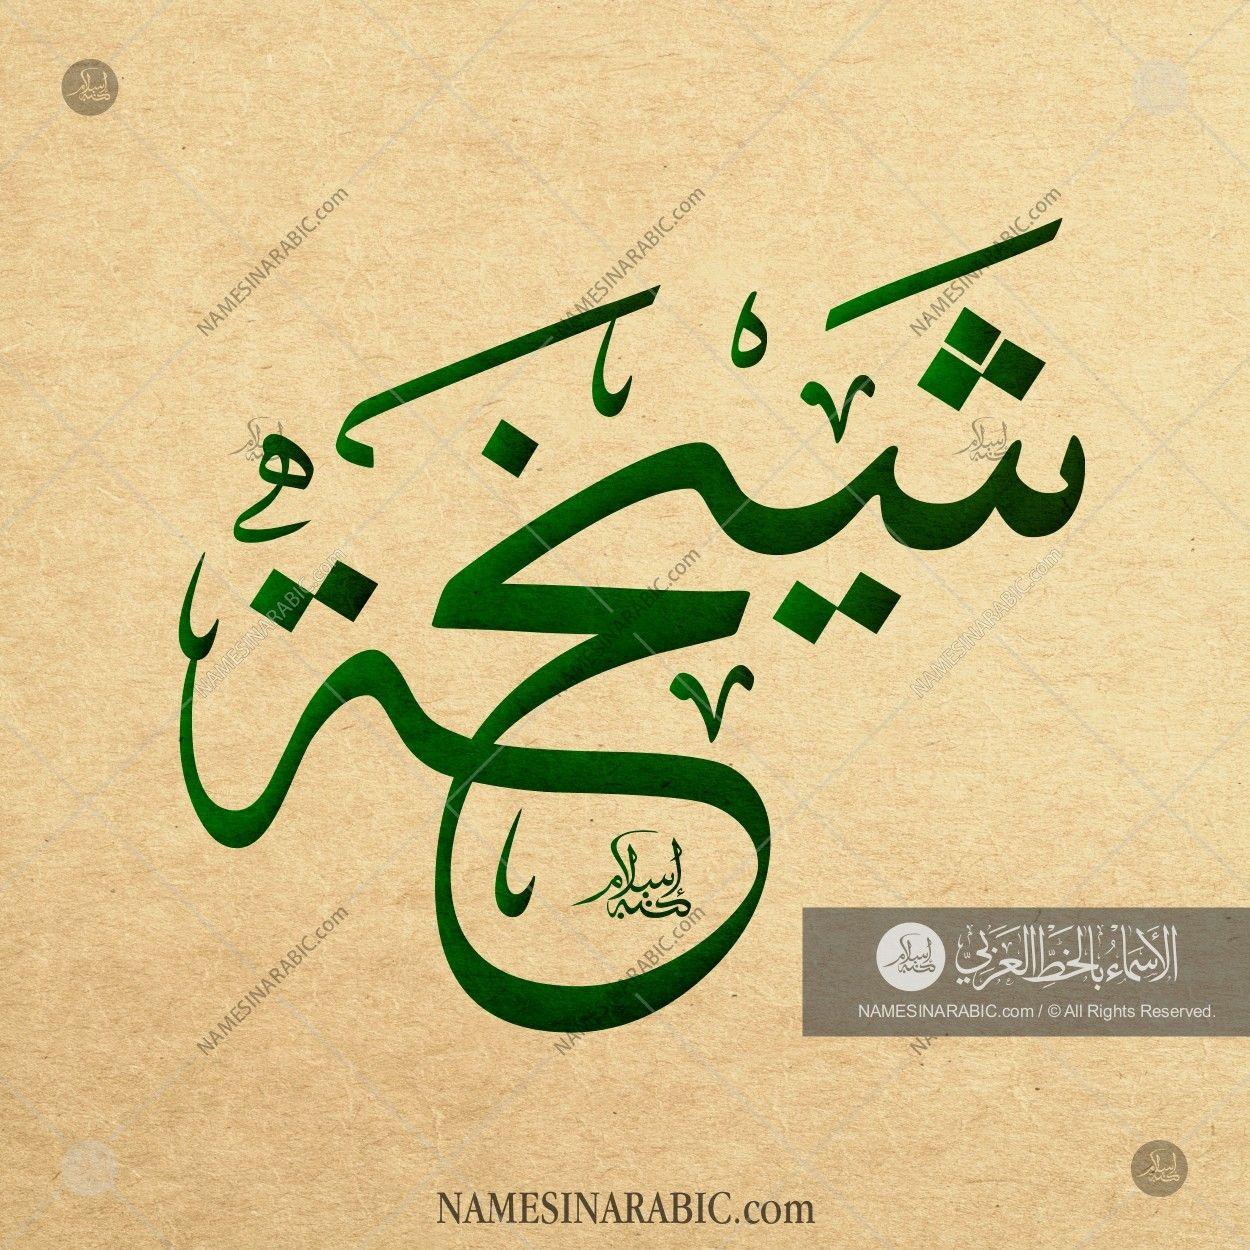 Sheikha شيخة Names In Arabic Calligraphy Name 3390 Calligraphy Name Art Calligraphy Name Arabic Calligraphy Art